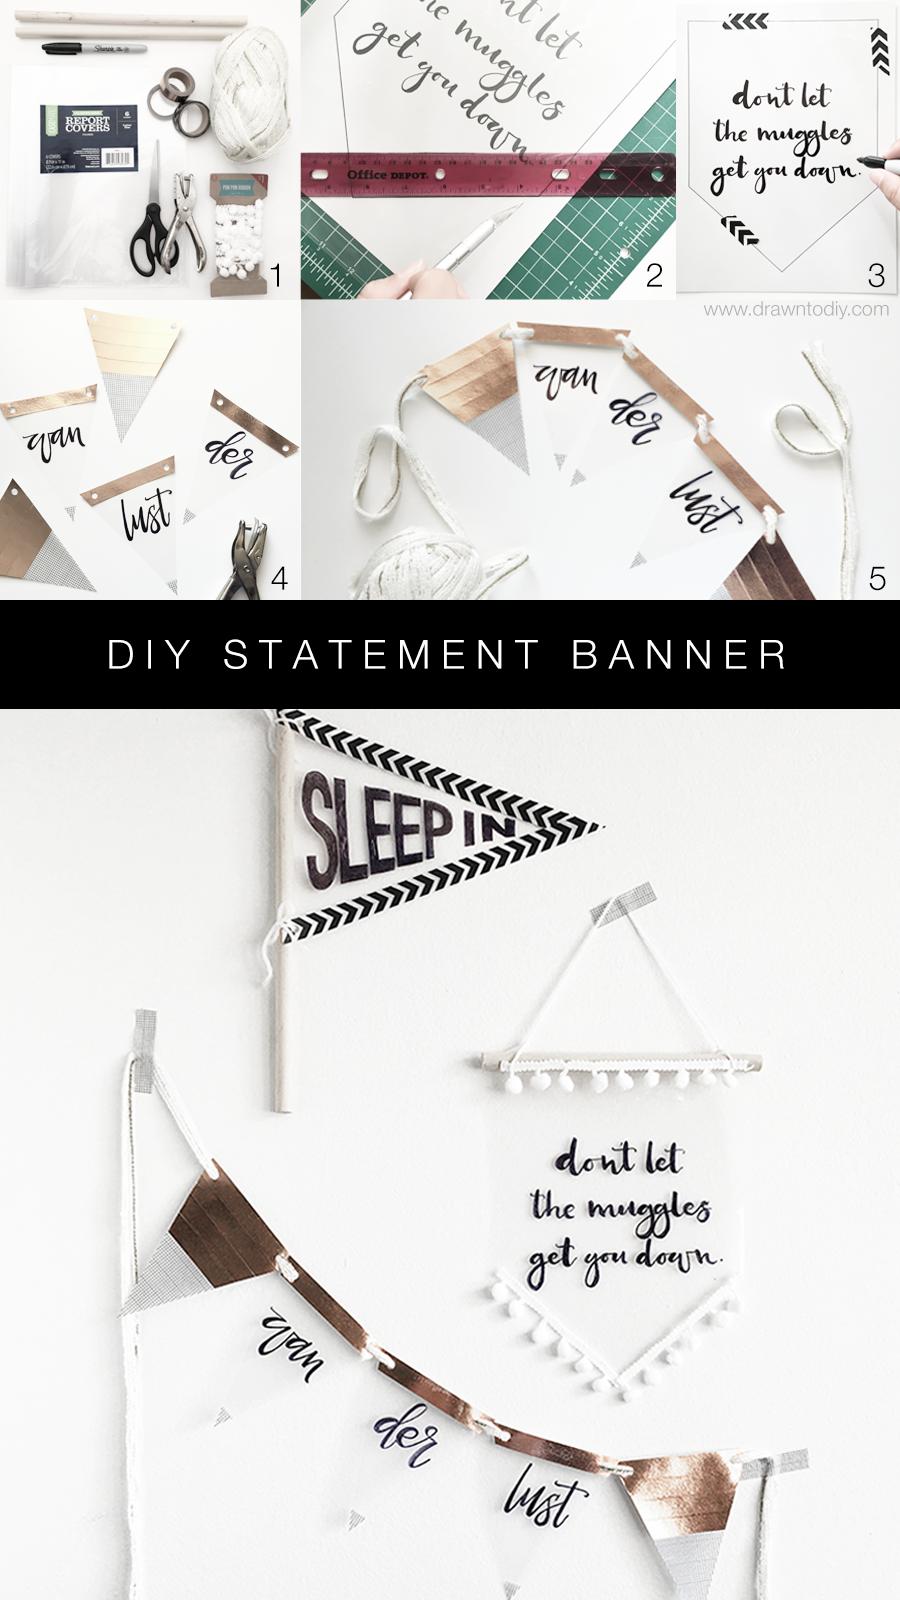 diy-statement-banner-by-drawn-to-diy-05